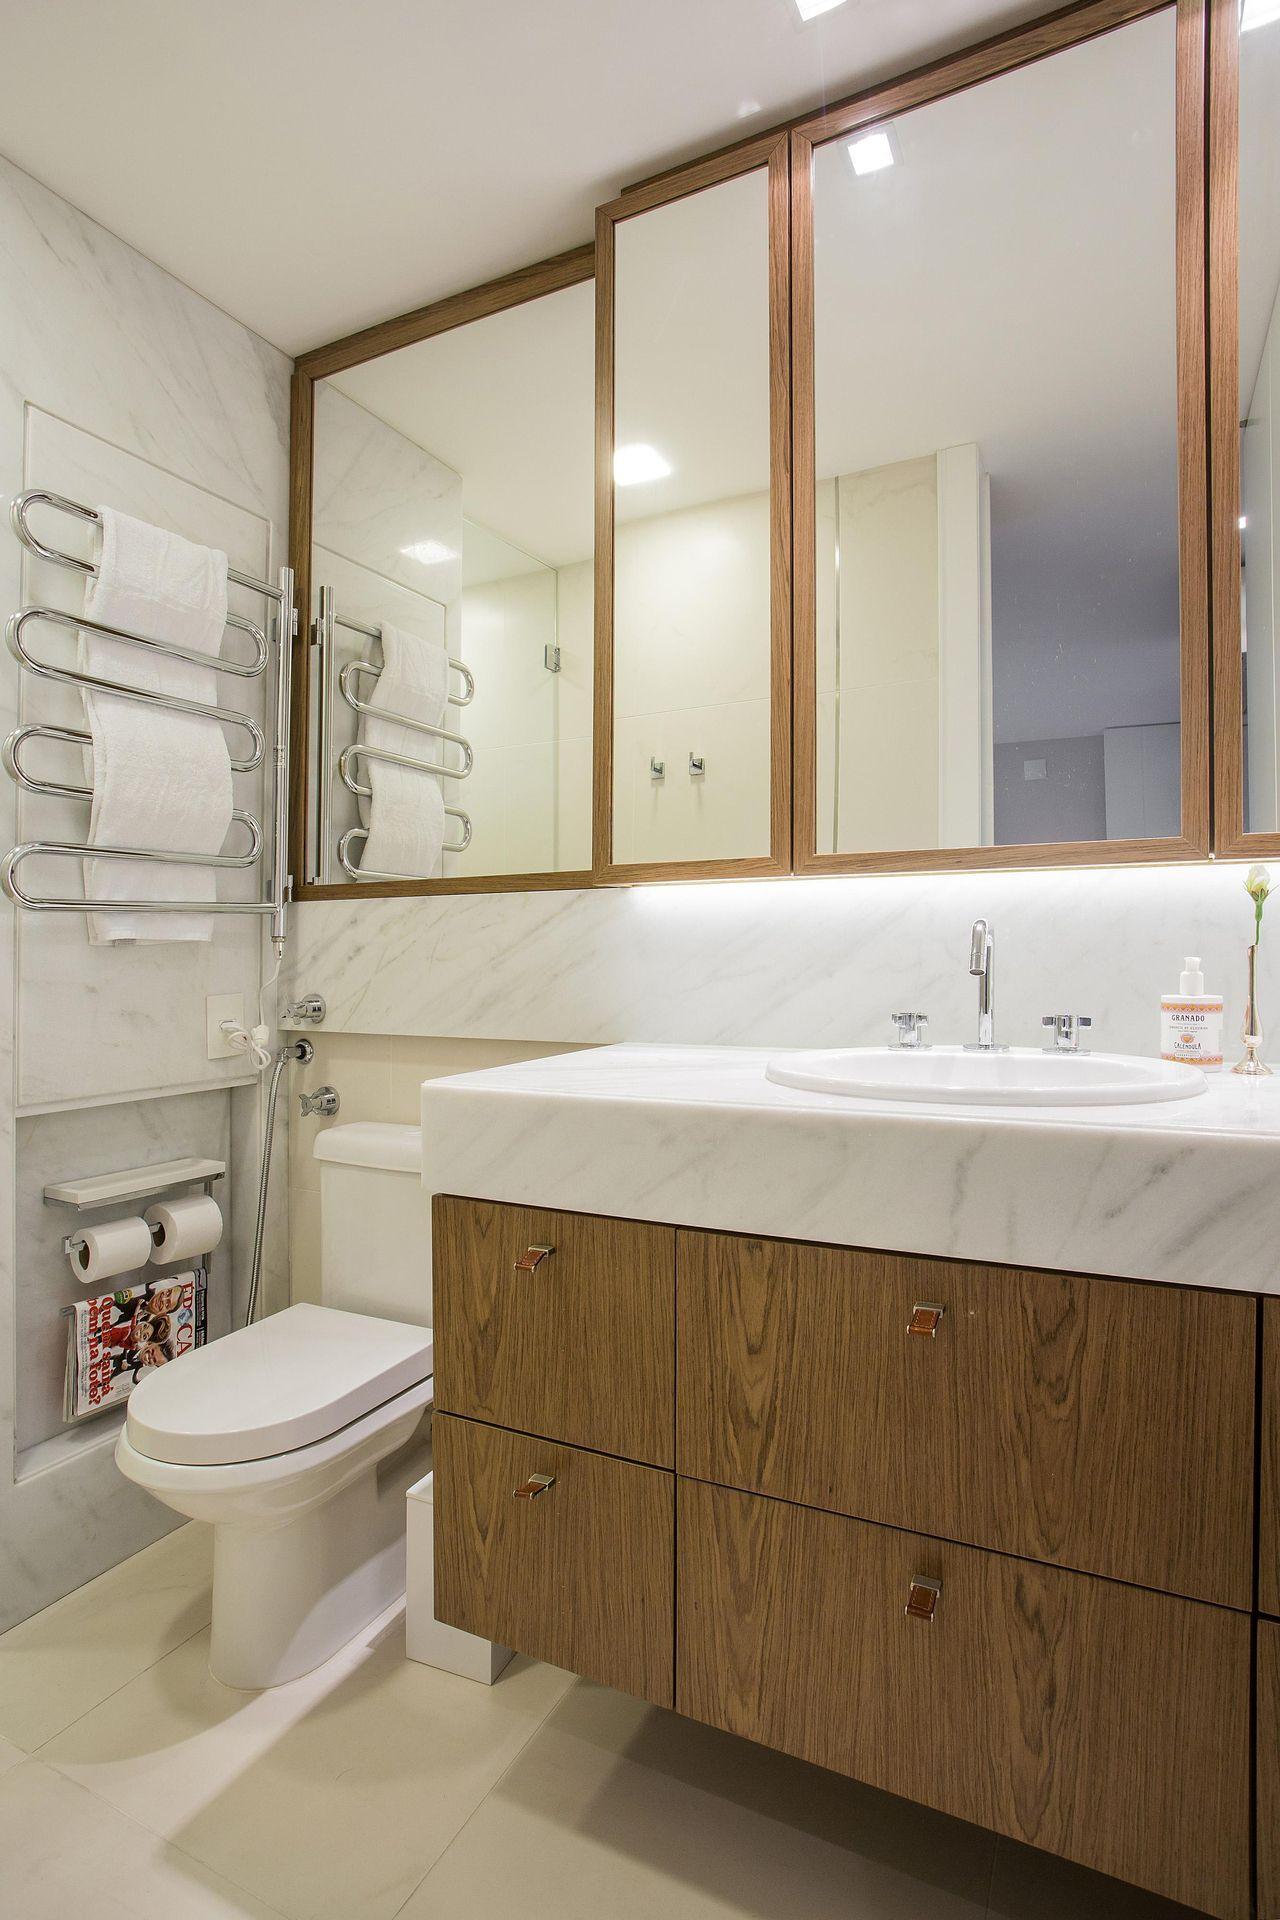 Tipos de cuba para banheiro: cubra de sobrepor (Projeto: Karla Silva)